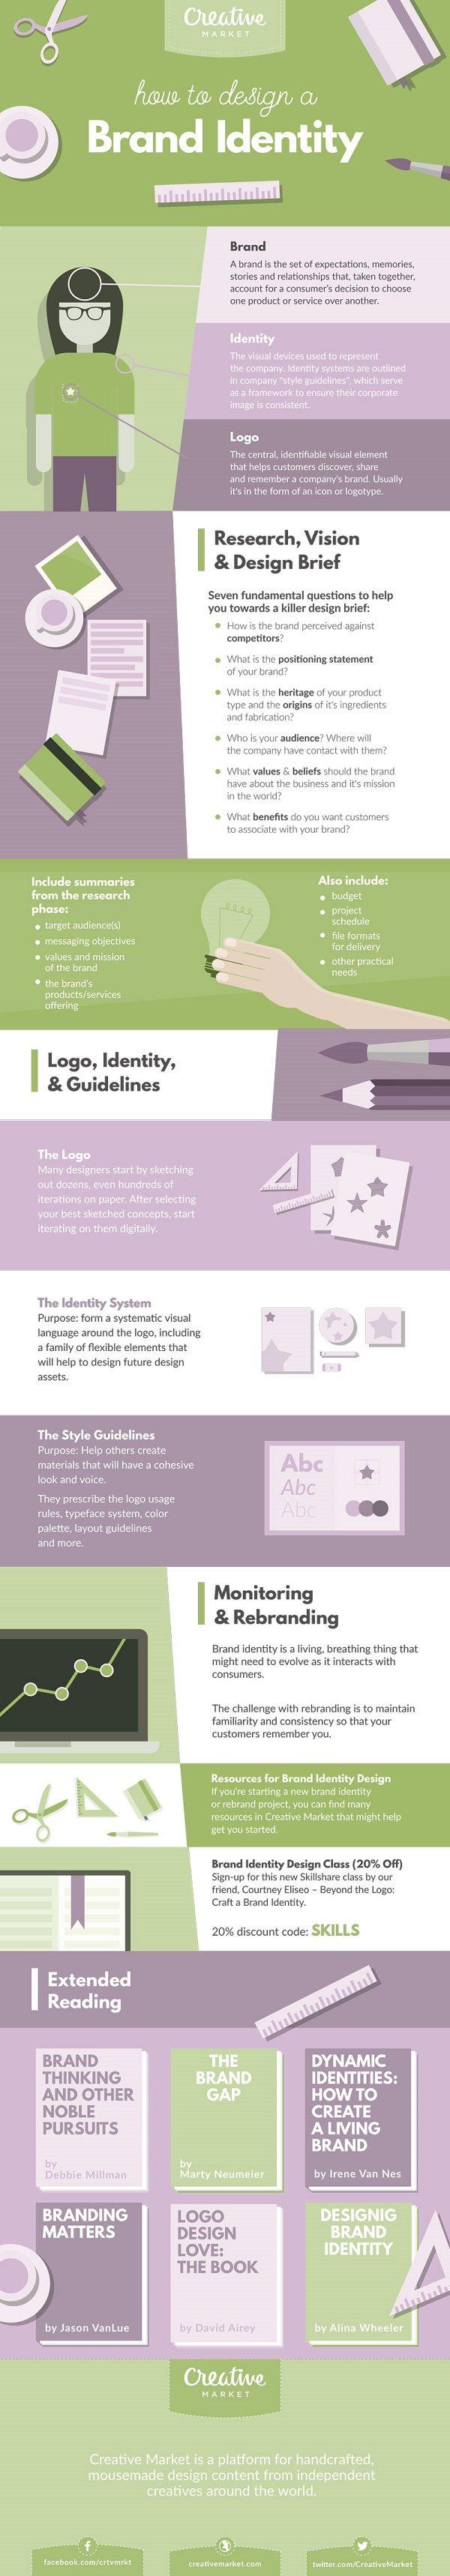 Infographic: How To Build A Visually Strong Brand Identity - DesignTAXI.com #entrepreneur...x